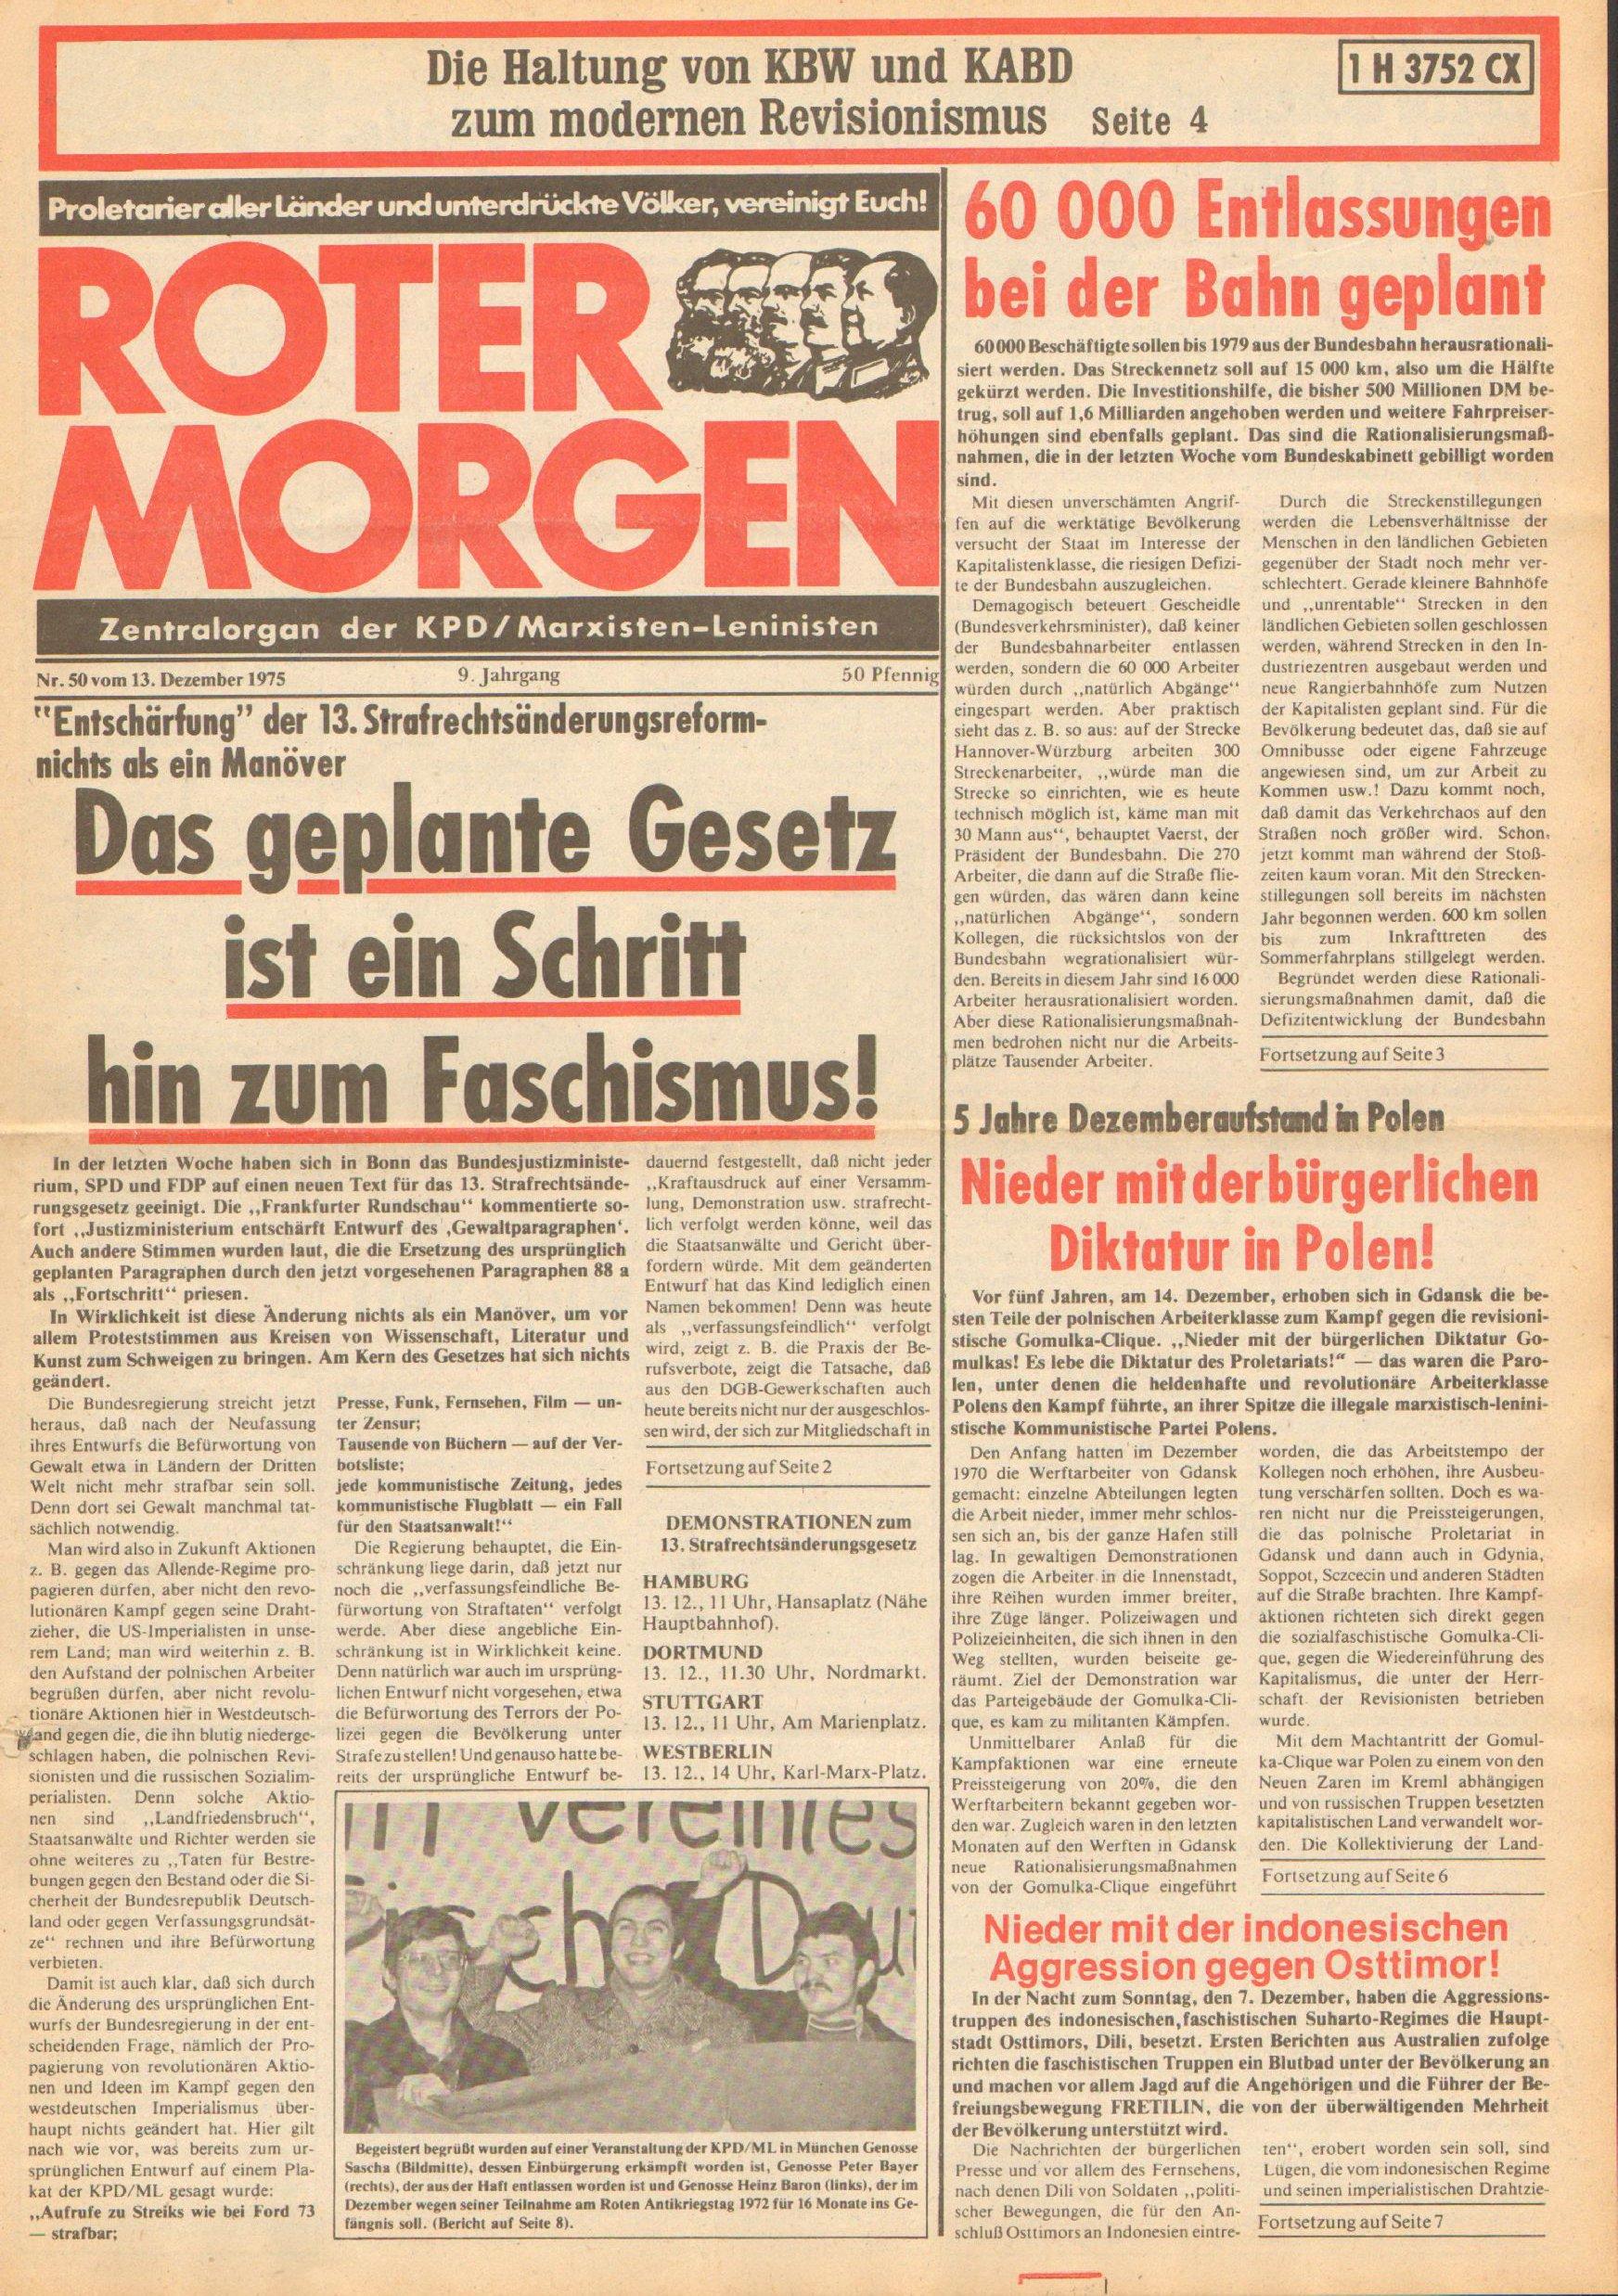 Roter Morgen, 9. Jg., 13. Dezember 1975, Nr. 50, Seite 1